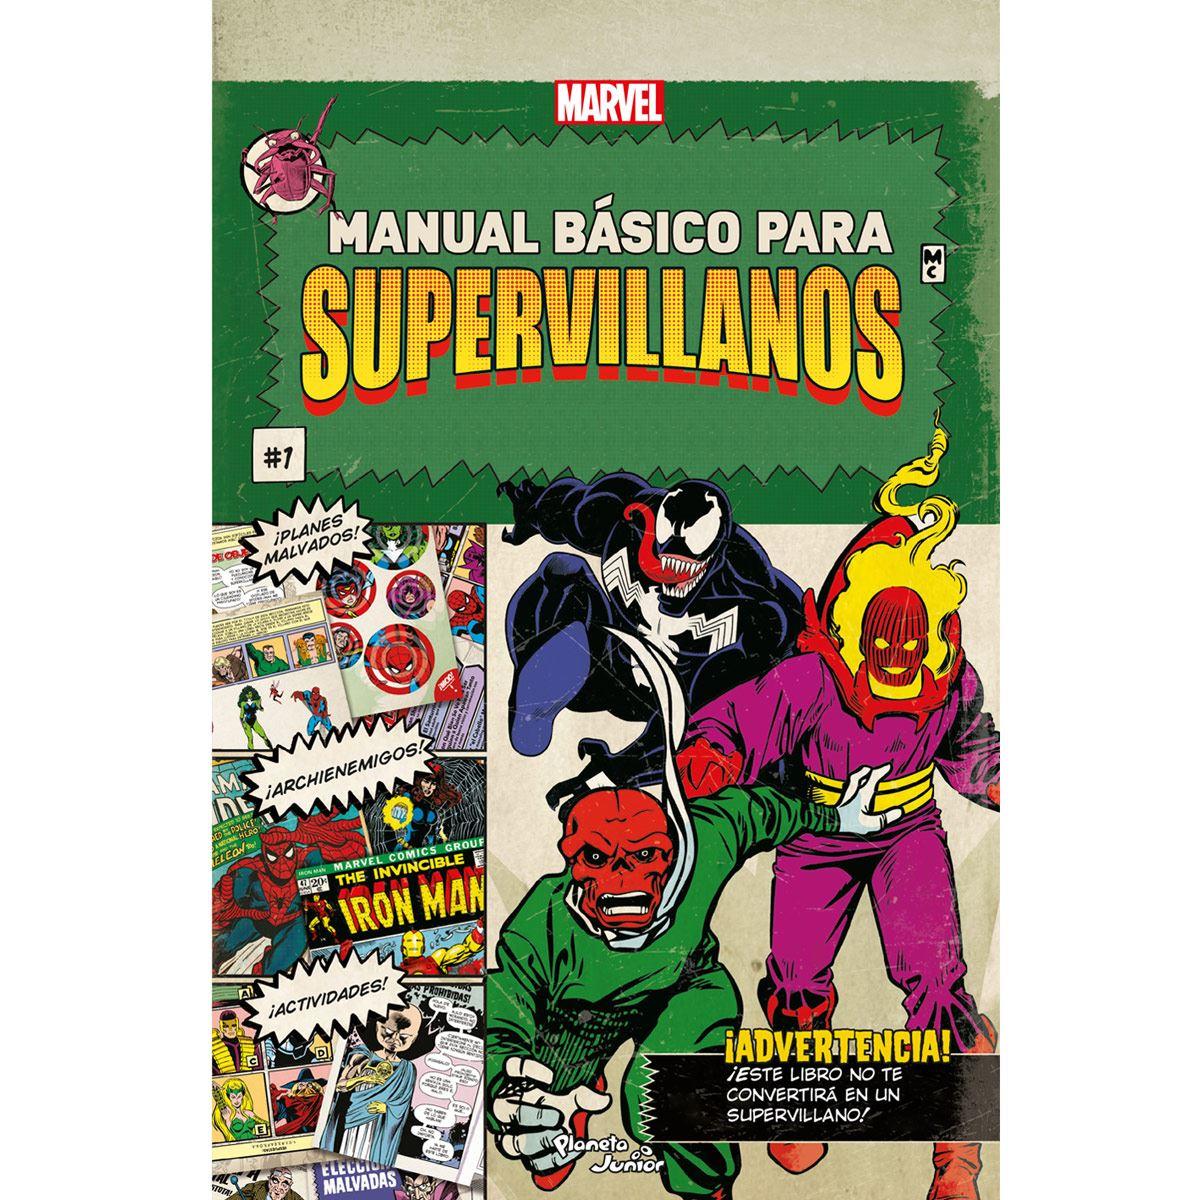 Manual básico para Supervillanos